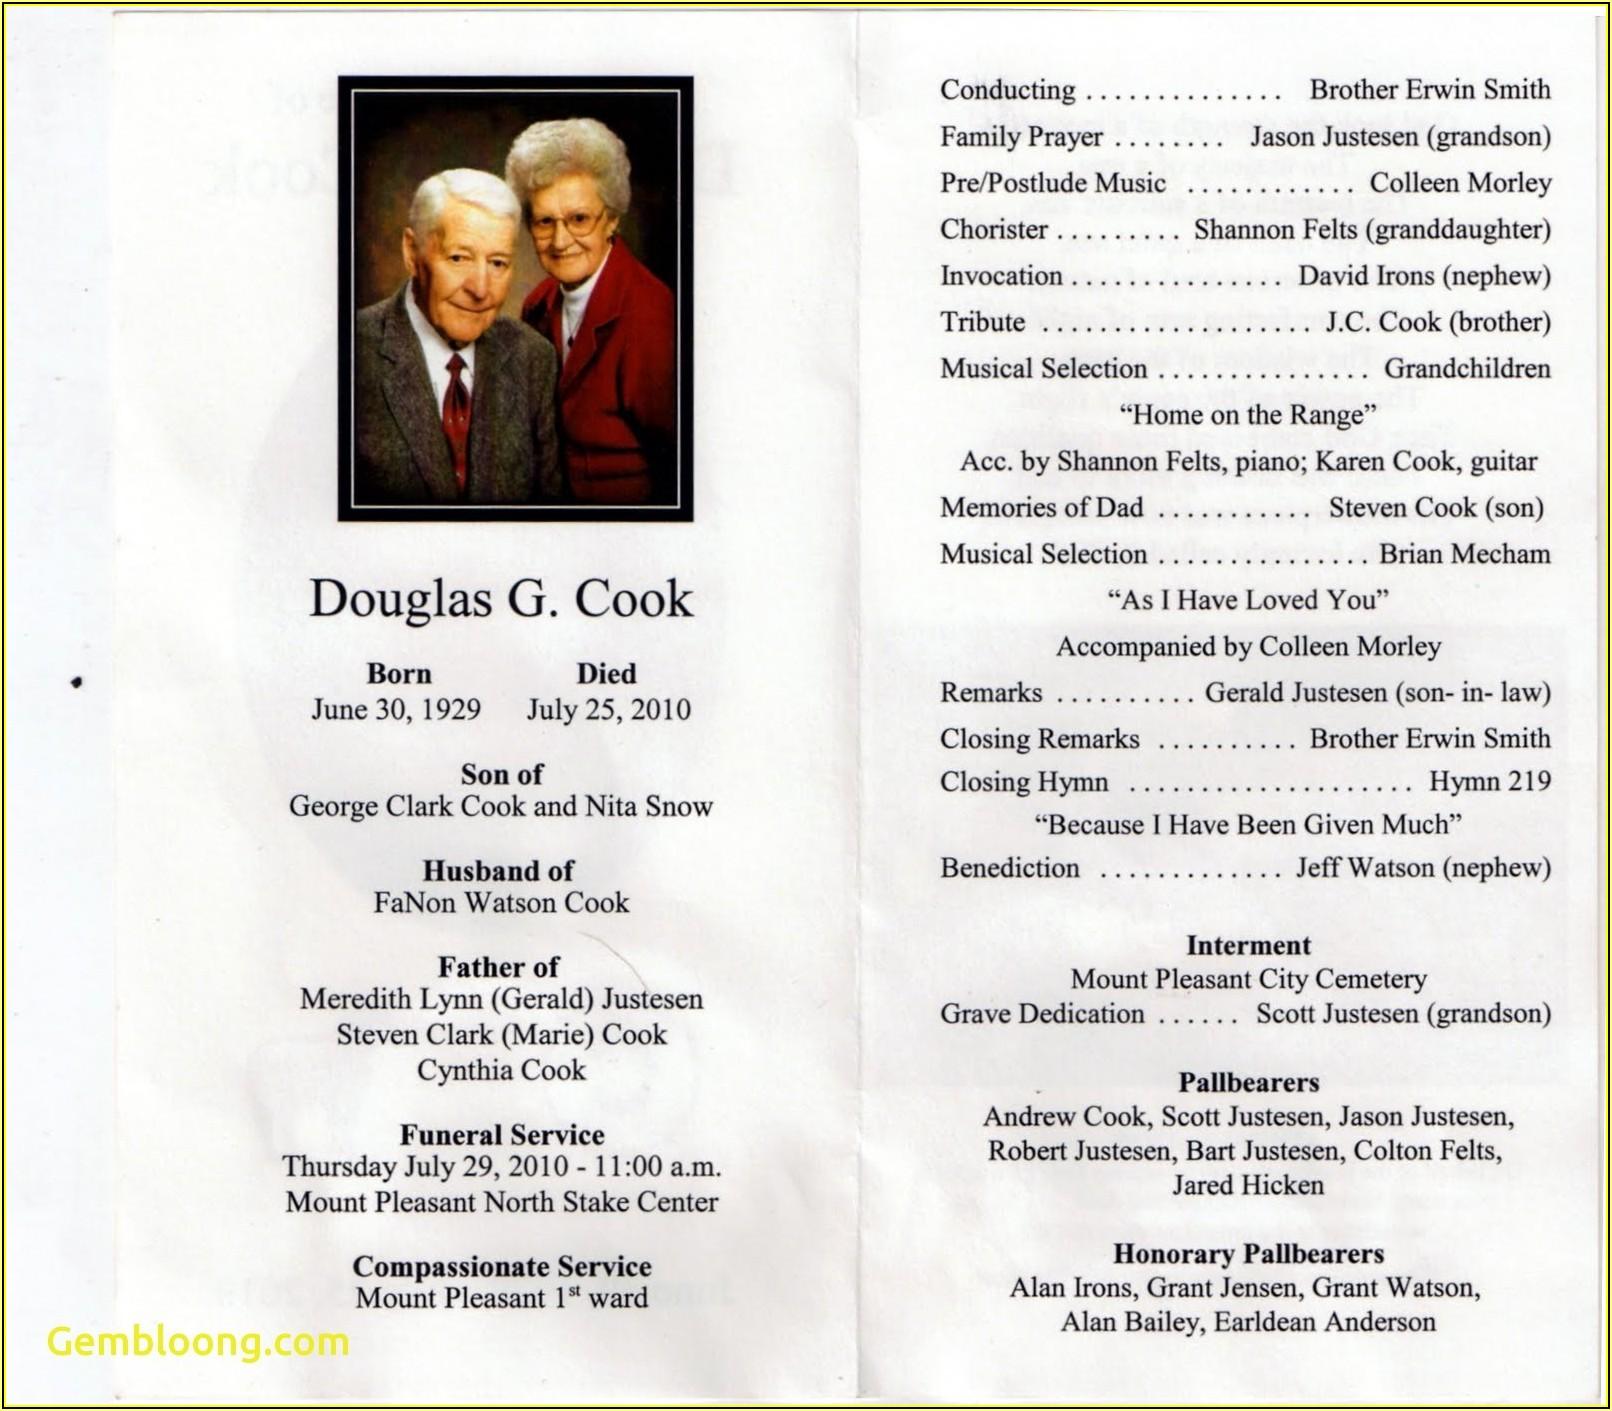 Funeral Service Obituary Program Samples